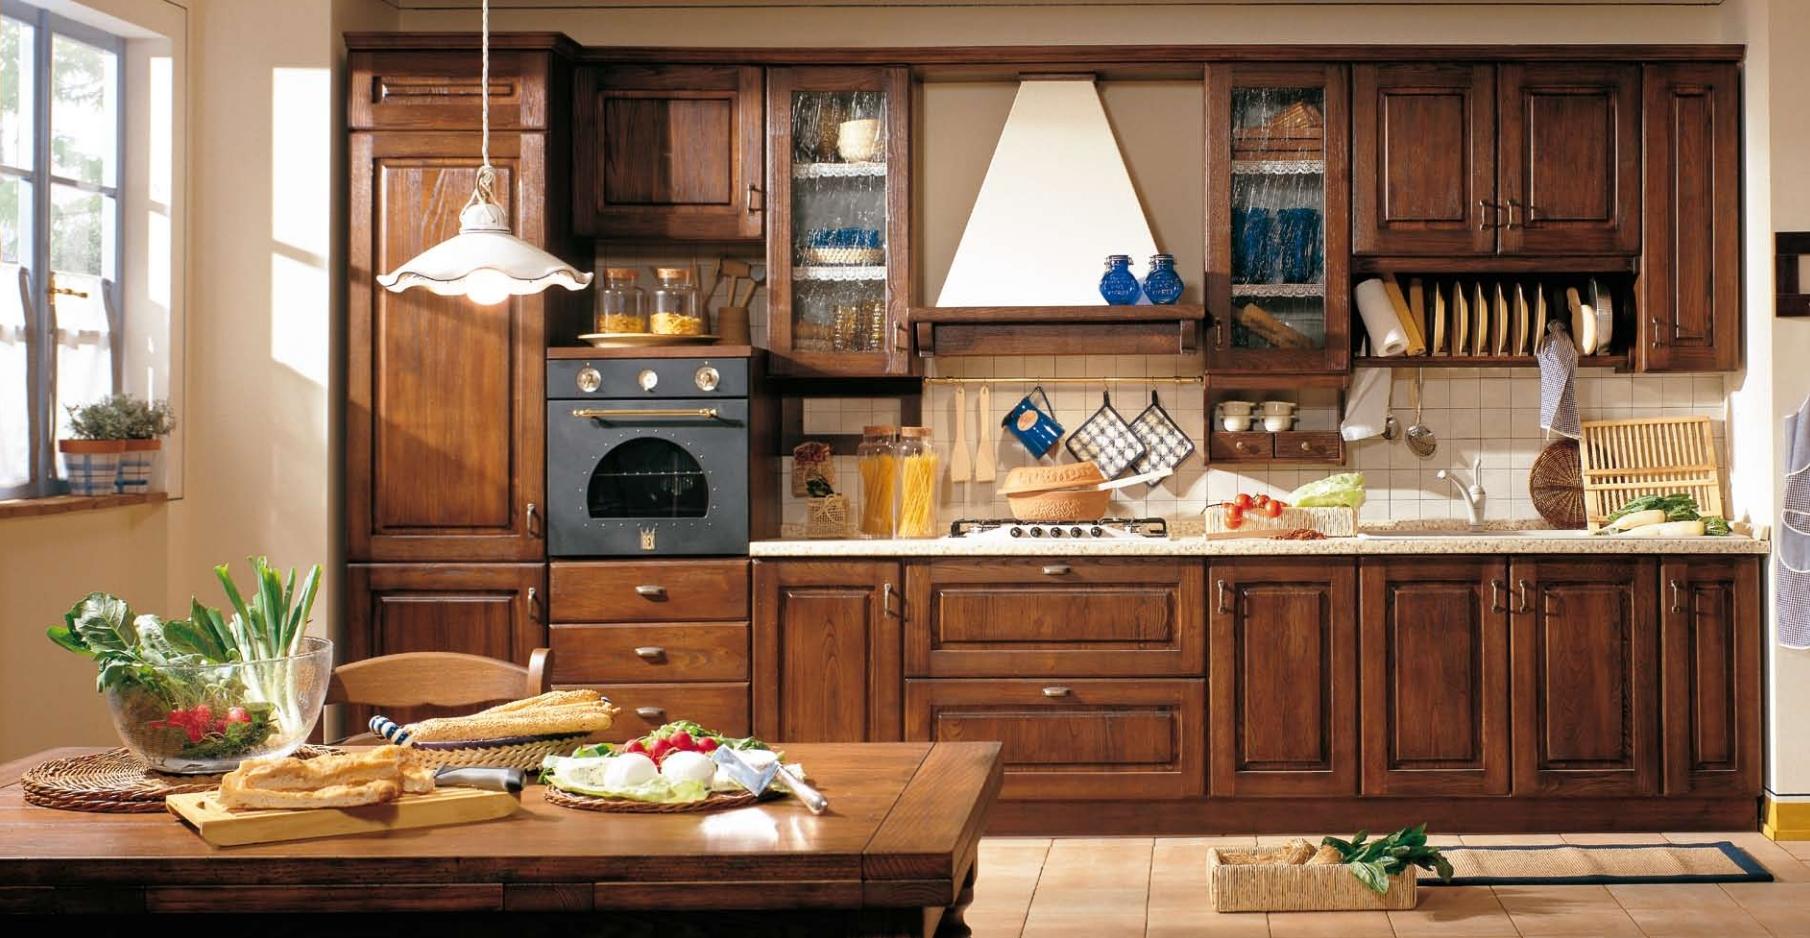 Красивый кухонный гарнитур из дуба